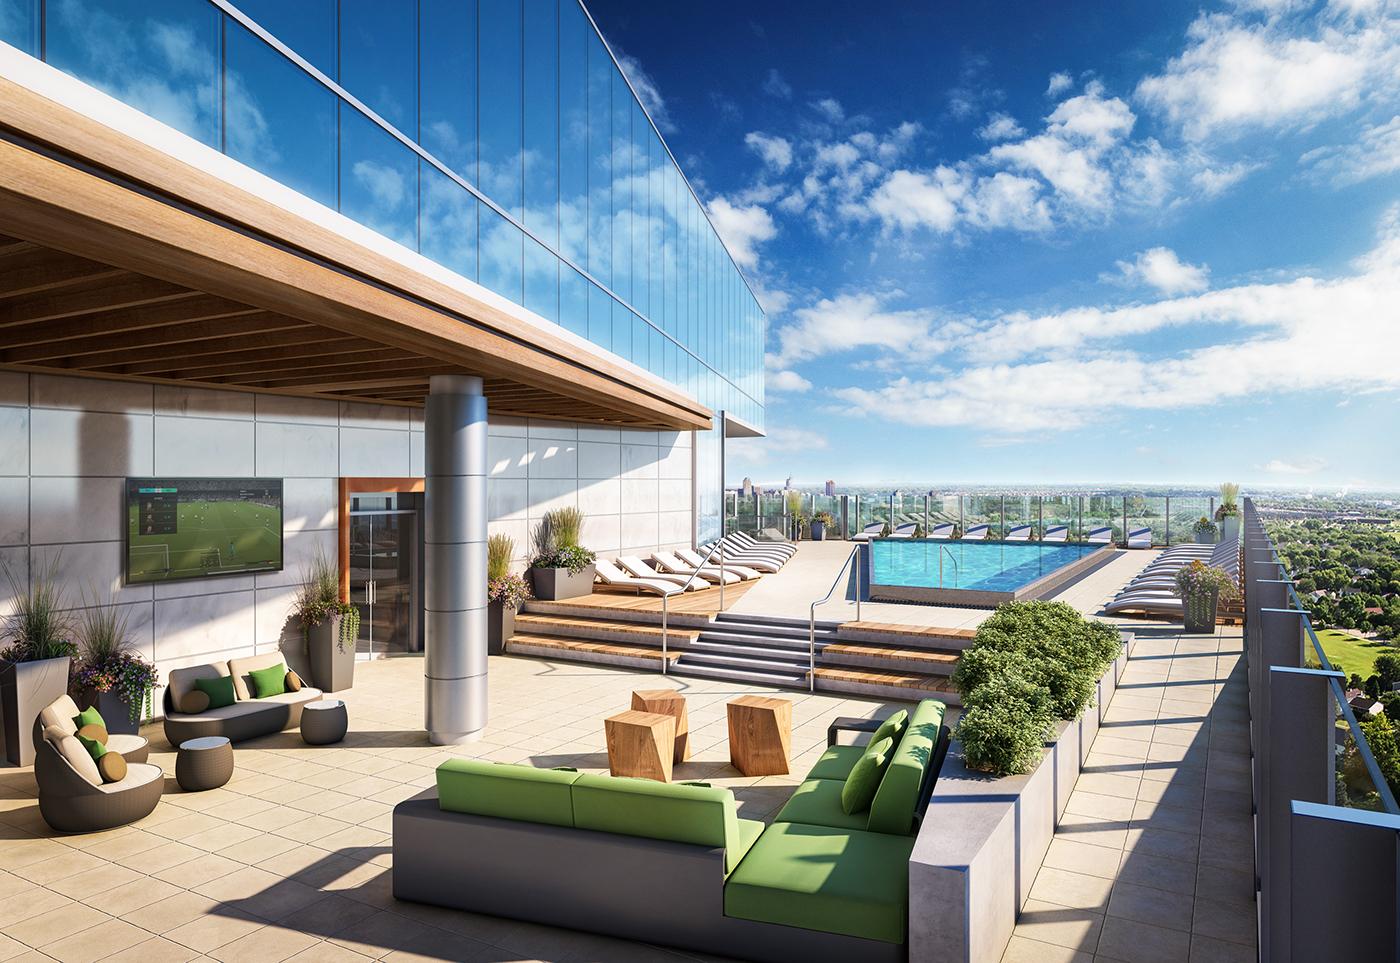 terrace Renderings architecture visualization